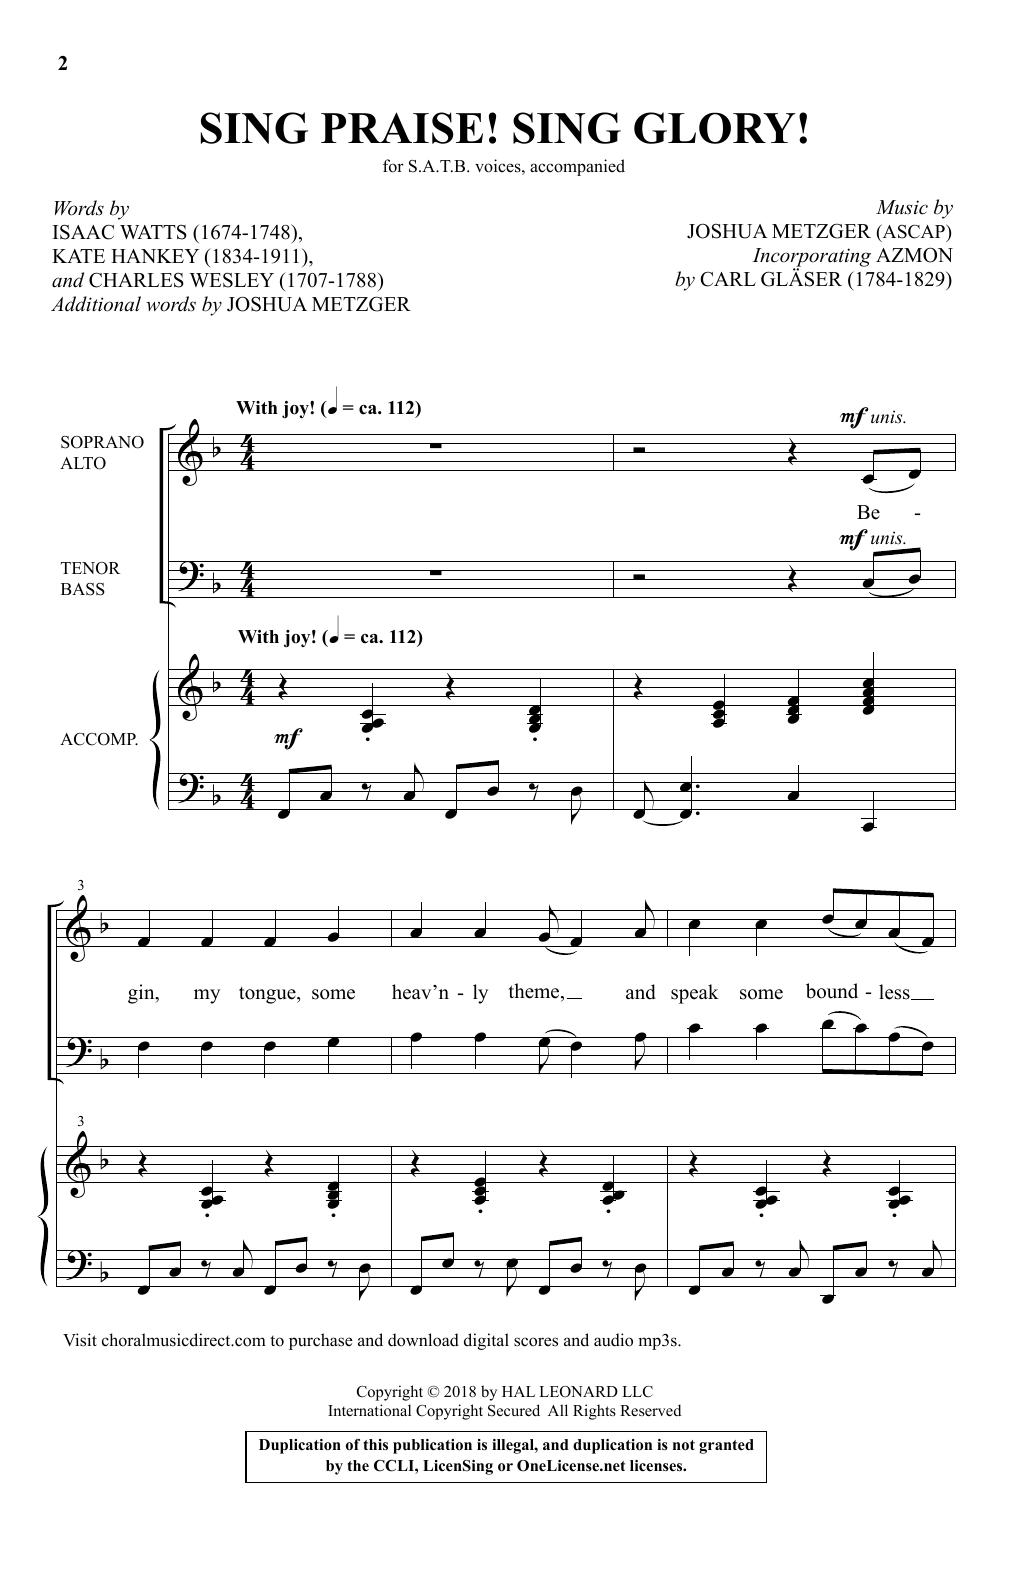 Sing Praise! Sing Glory! (SATB Choir)